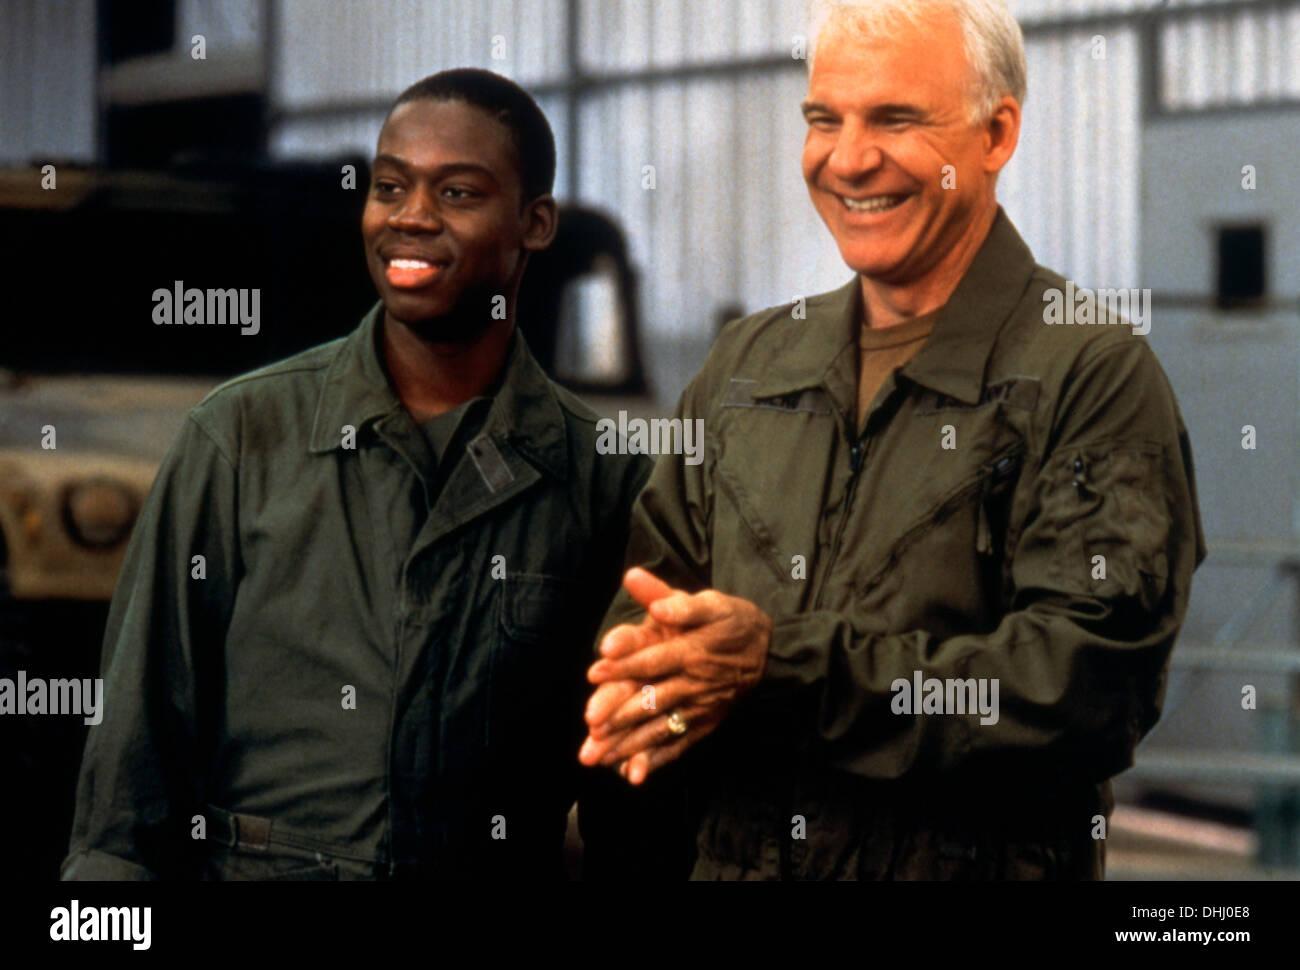 SGT BILKO (1996) STEVE MARTIN JONATHAN LYNN (DIR) 008 MOVIESTORE COLLECTION LTD - Stock Image